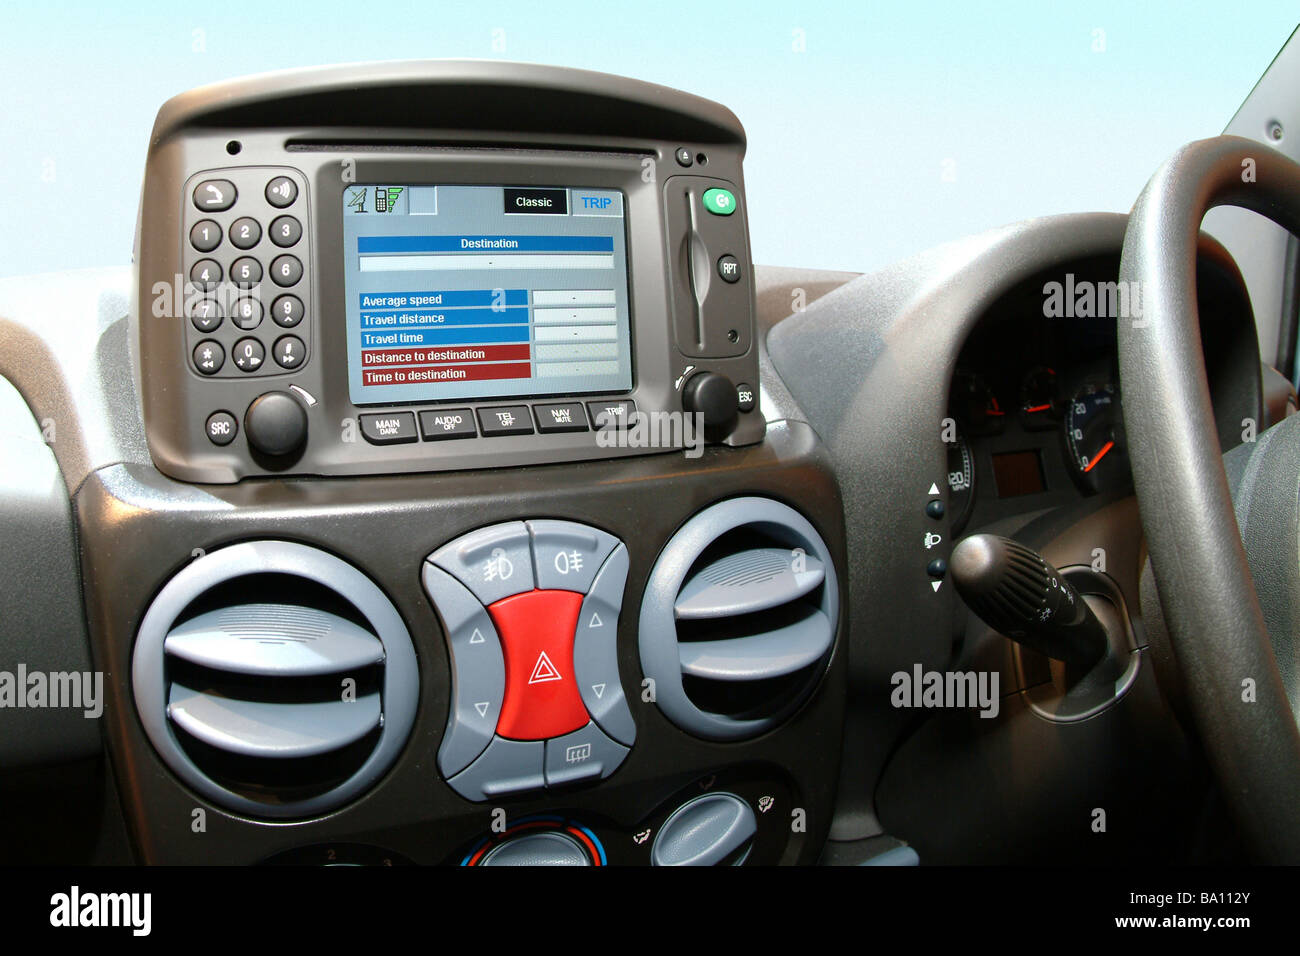 Satellite navigation display on a fiat doblo car - Stock Image